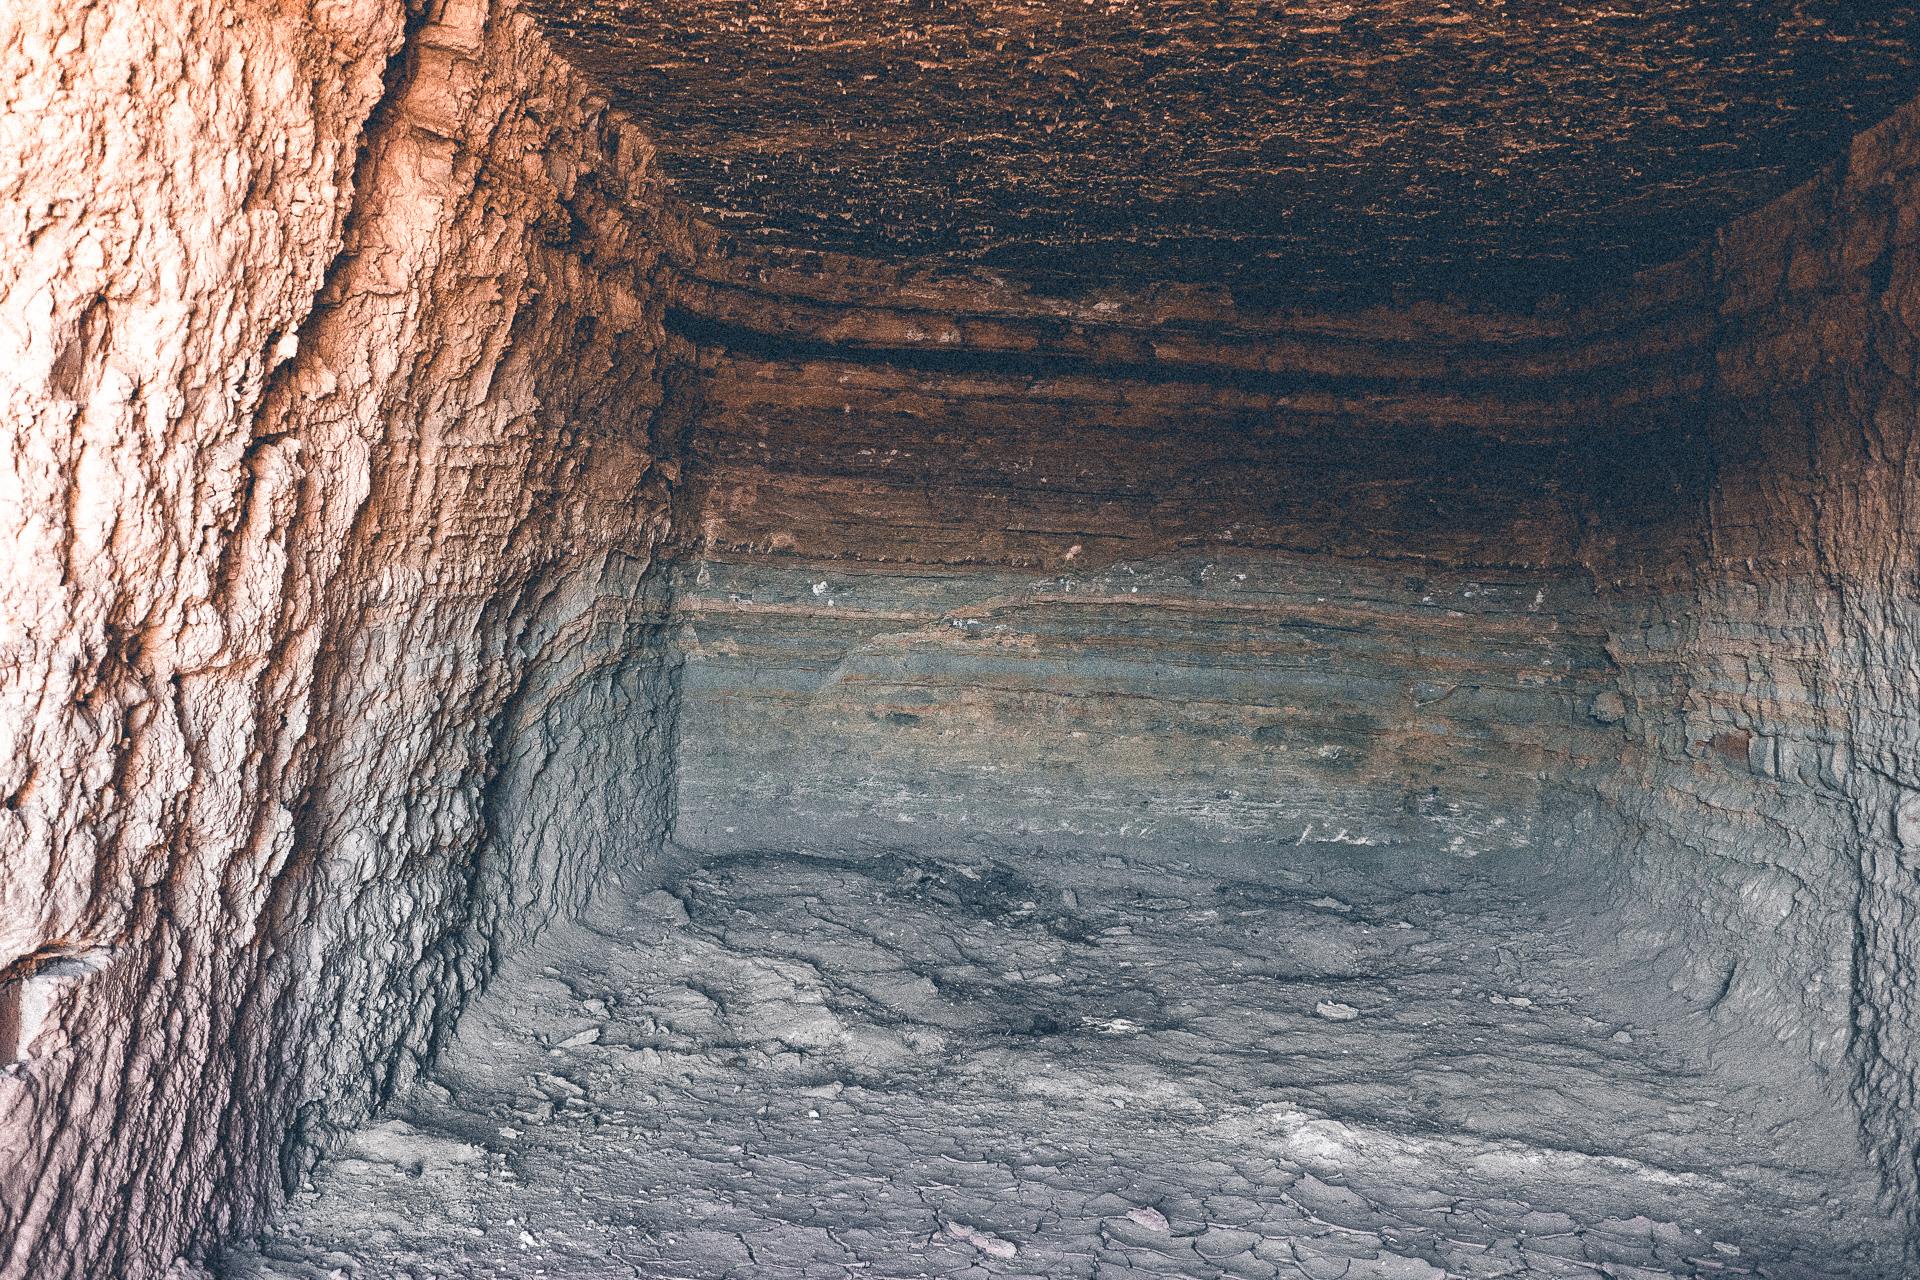 Höhle in Fels geschlagen